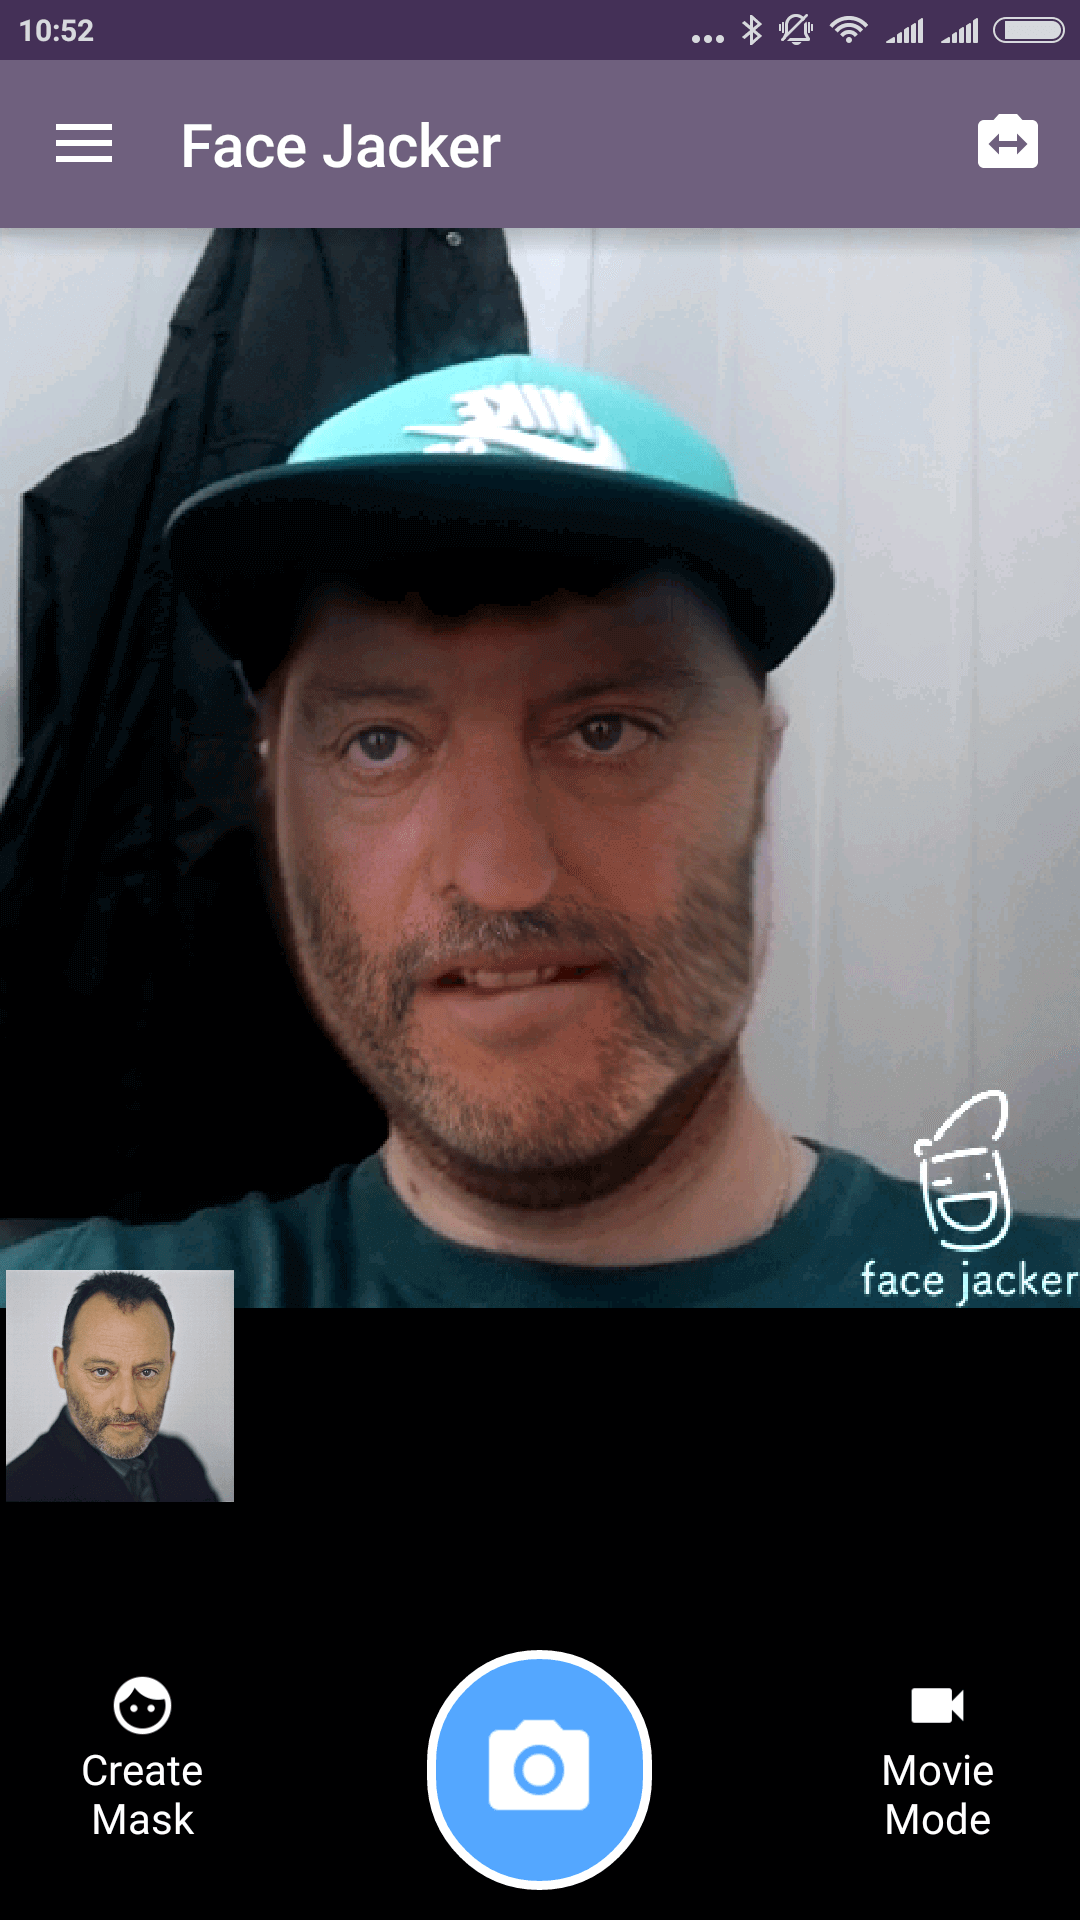 Screenshot_2016-05-04-10-52-53_commanderprompt.facejacker